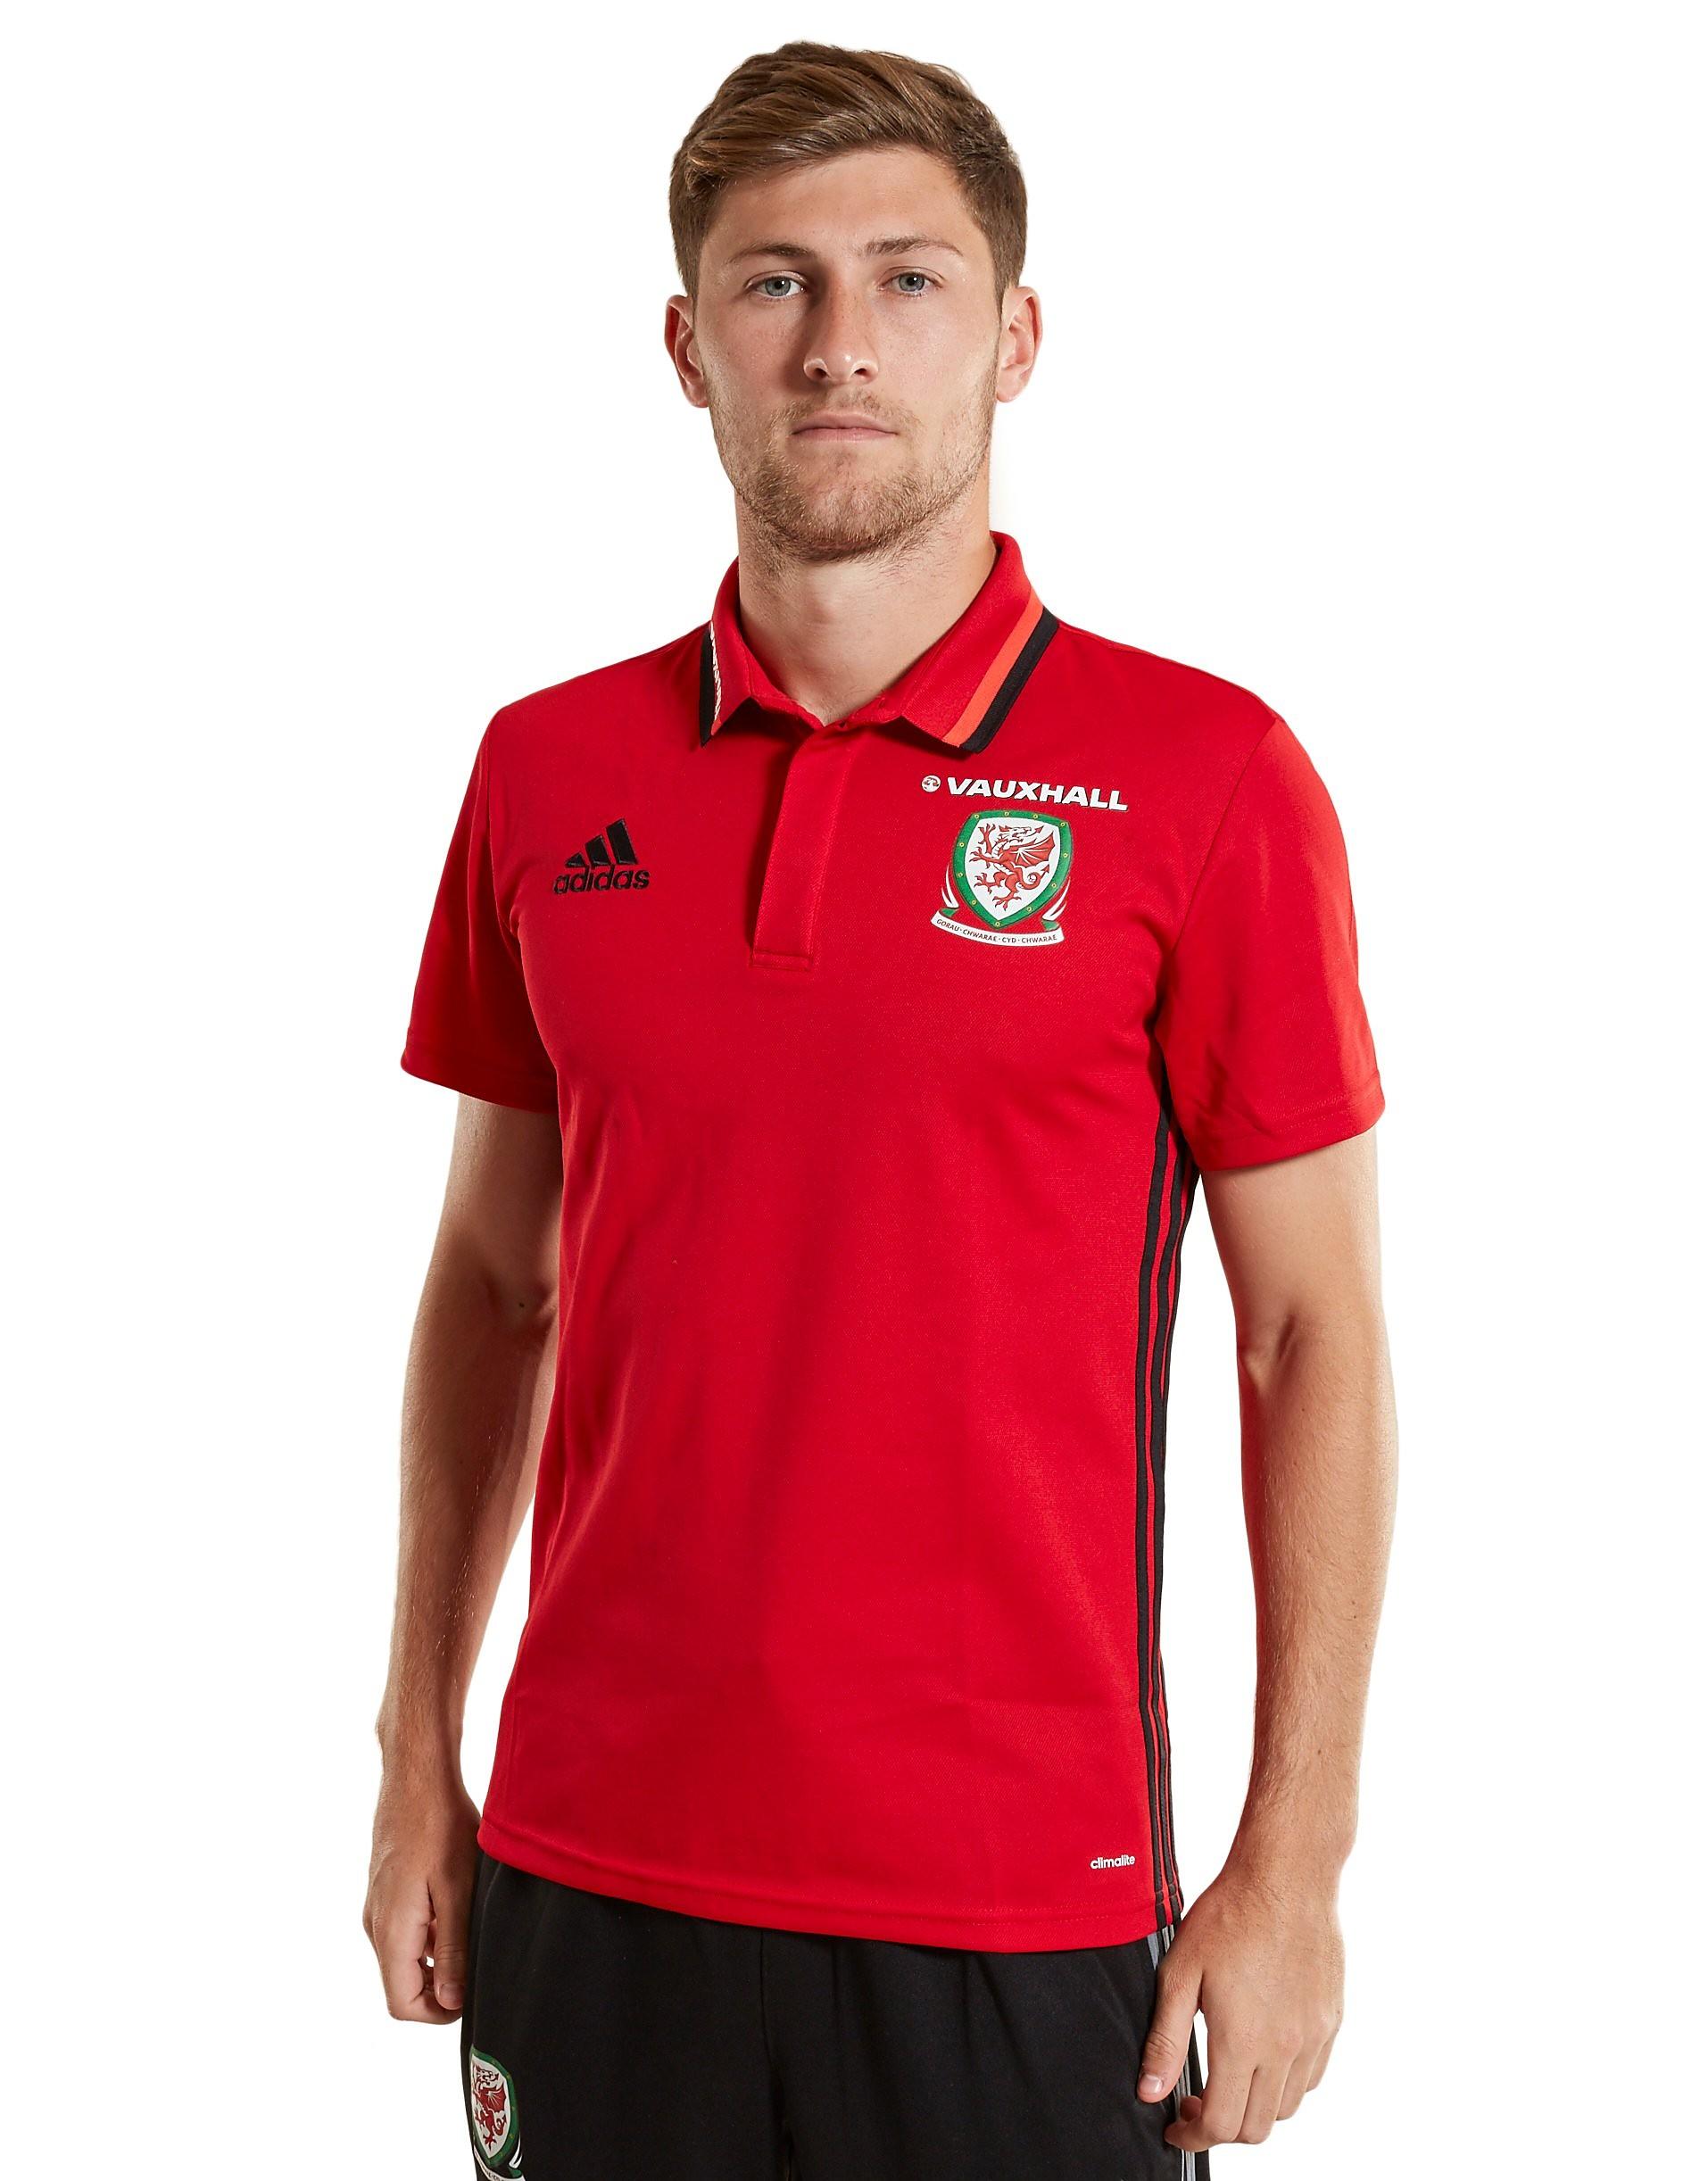 adidas Wales 2016/17 Climalite-poloshirt - Rood - Heren